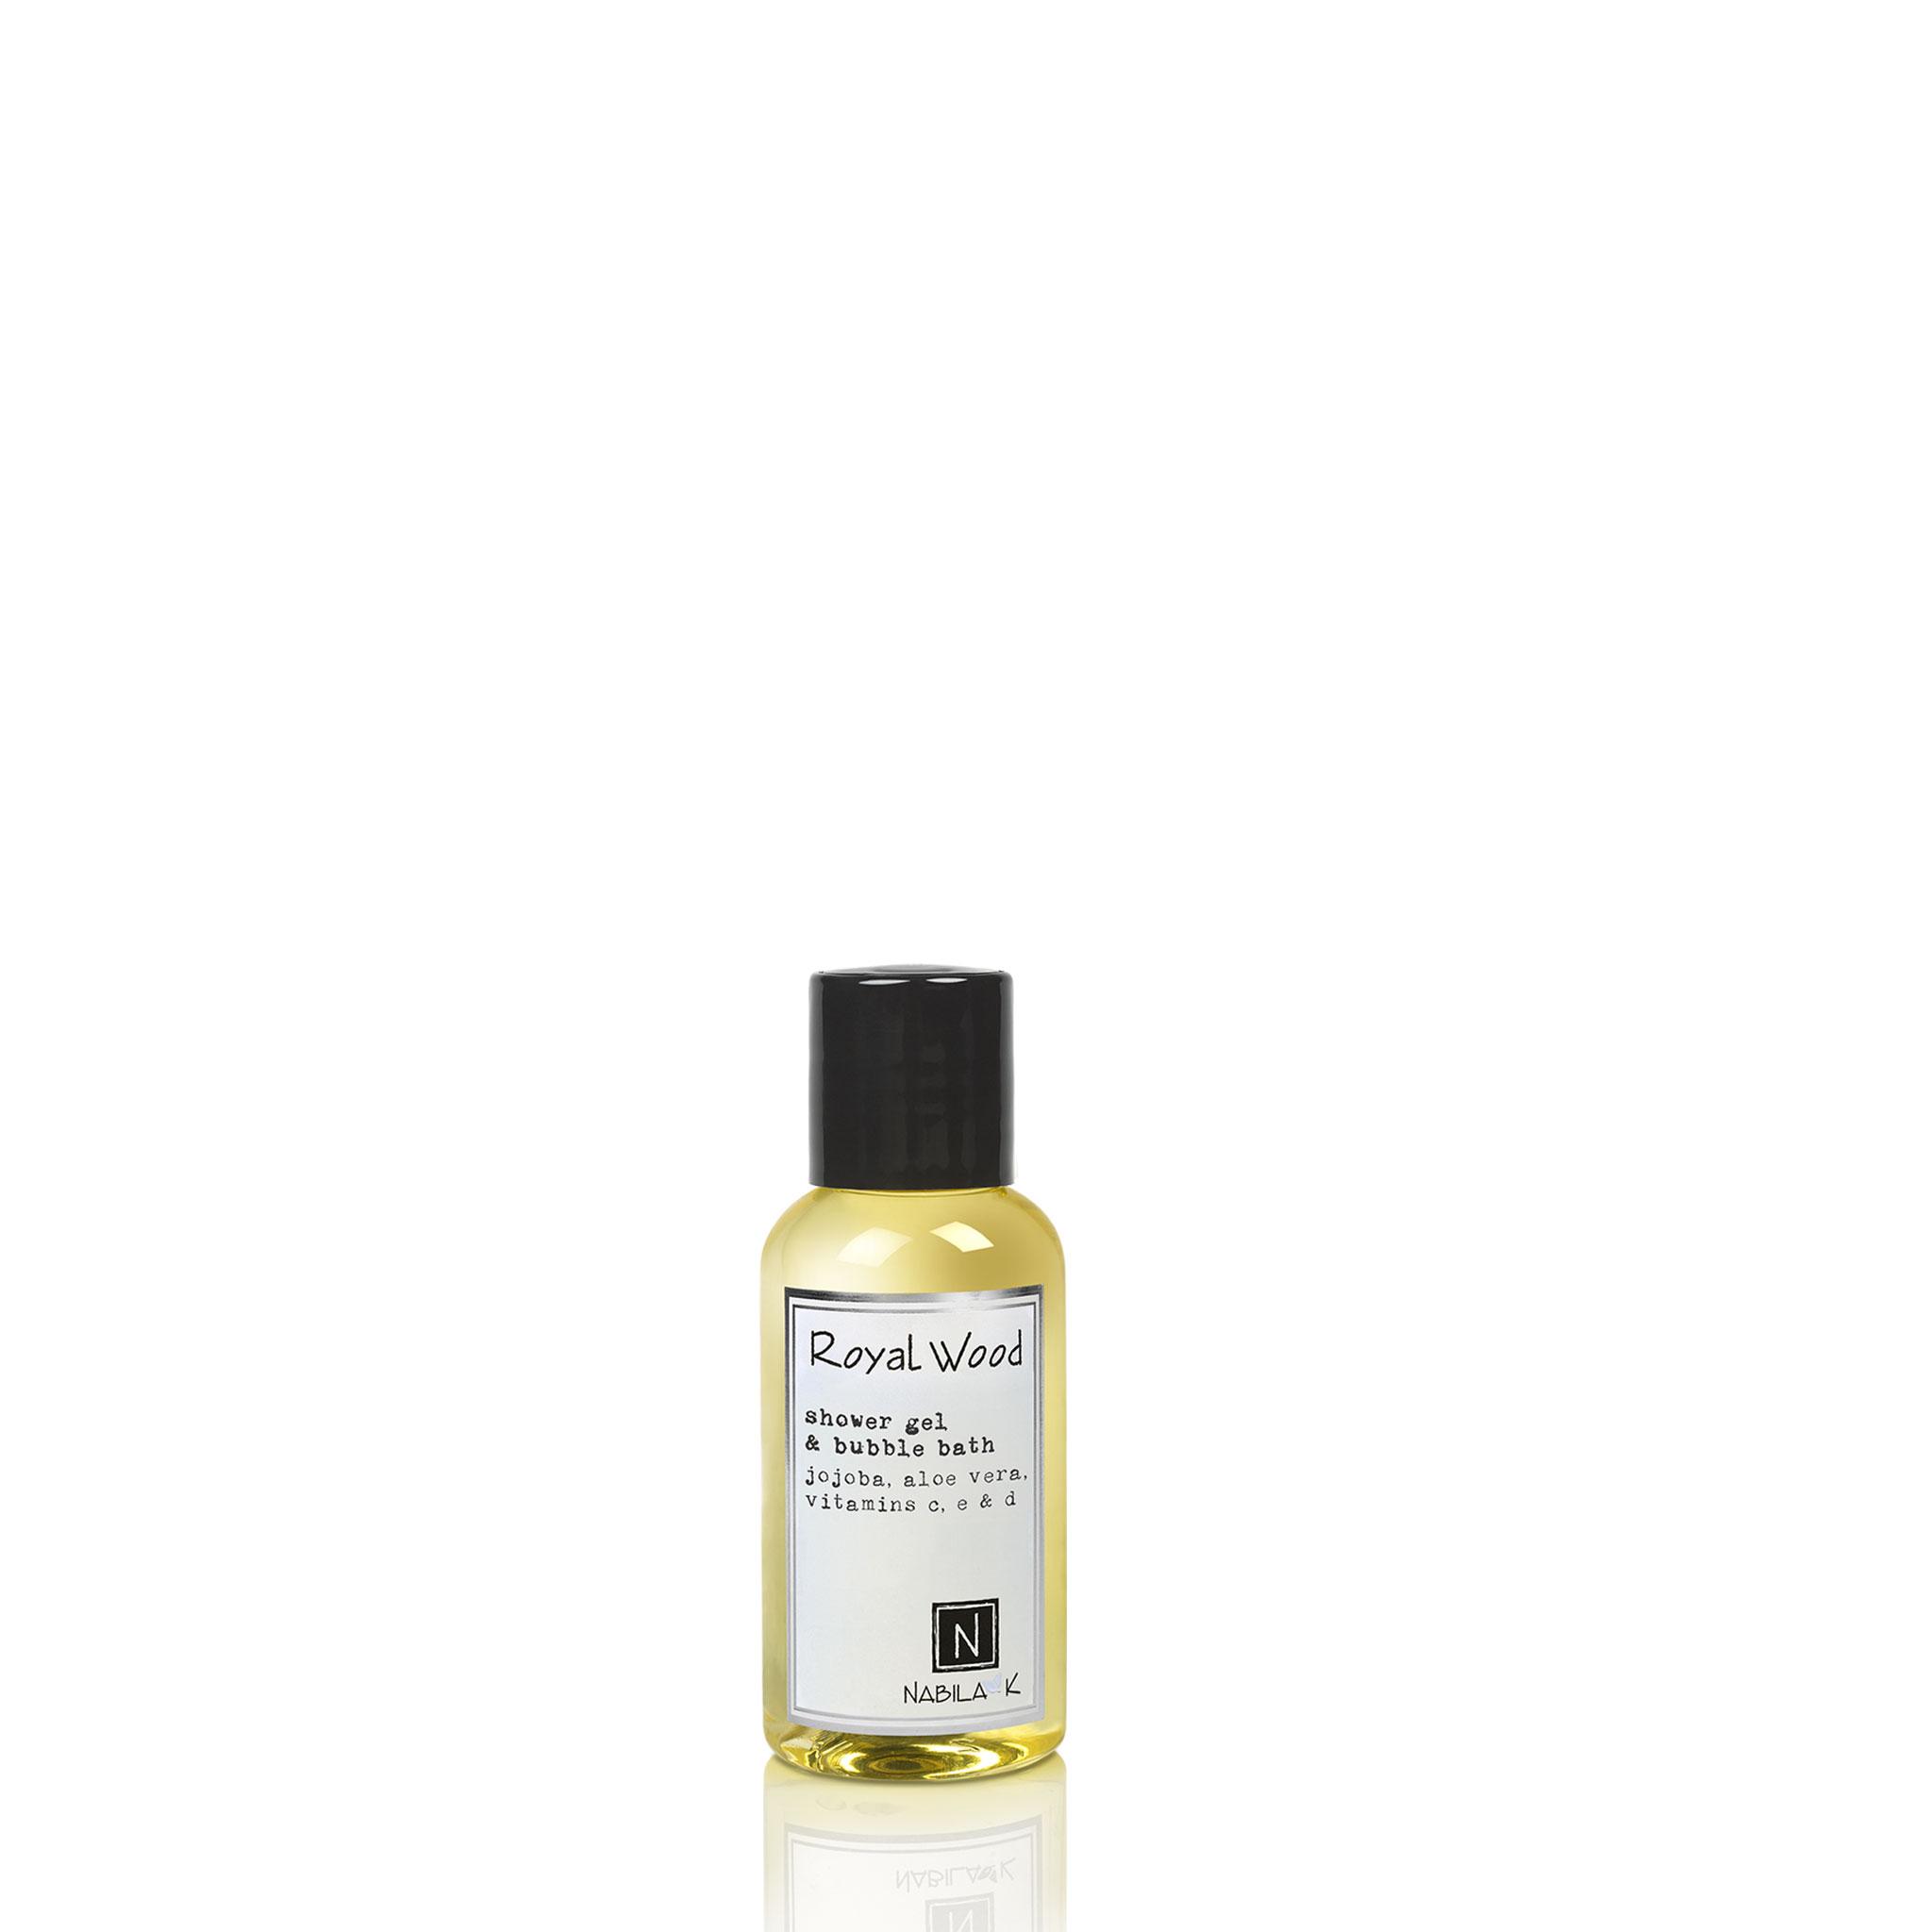 One Travel Size Version of Nabila K's Royal Wood Shower Gel and Bubble Bath Jojoba, Aloe Vera, Vitamins C, E, & D